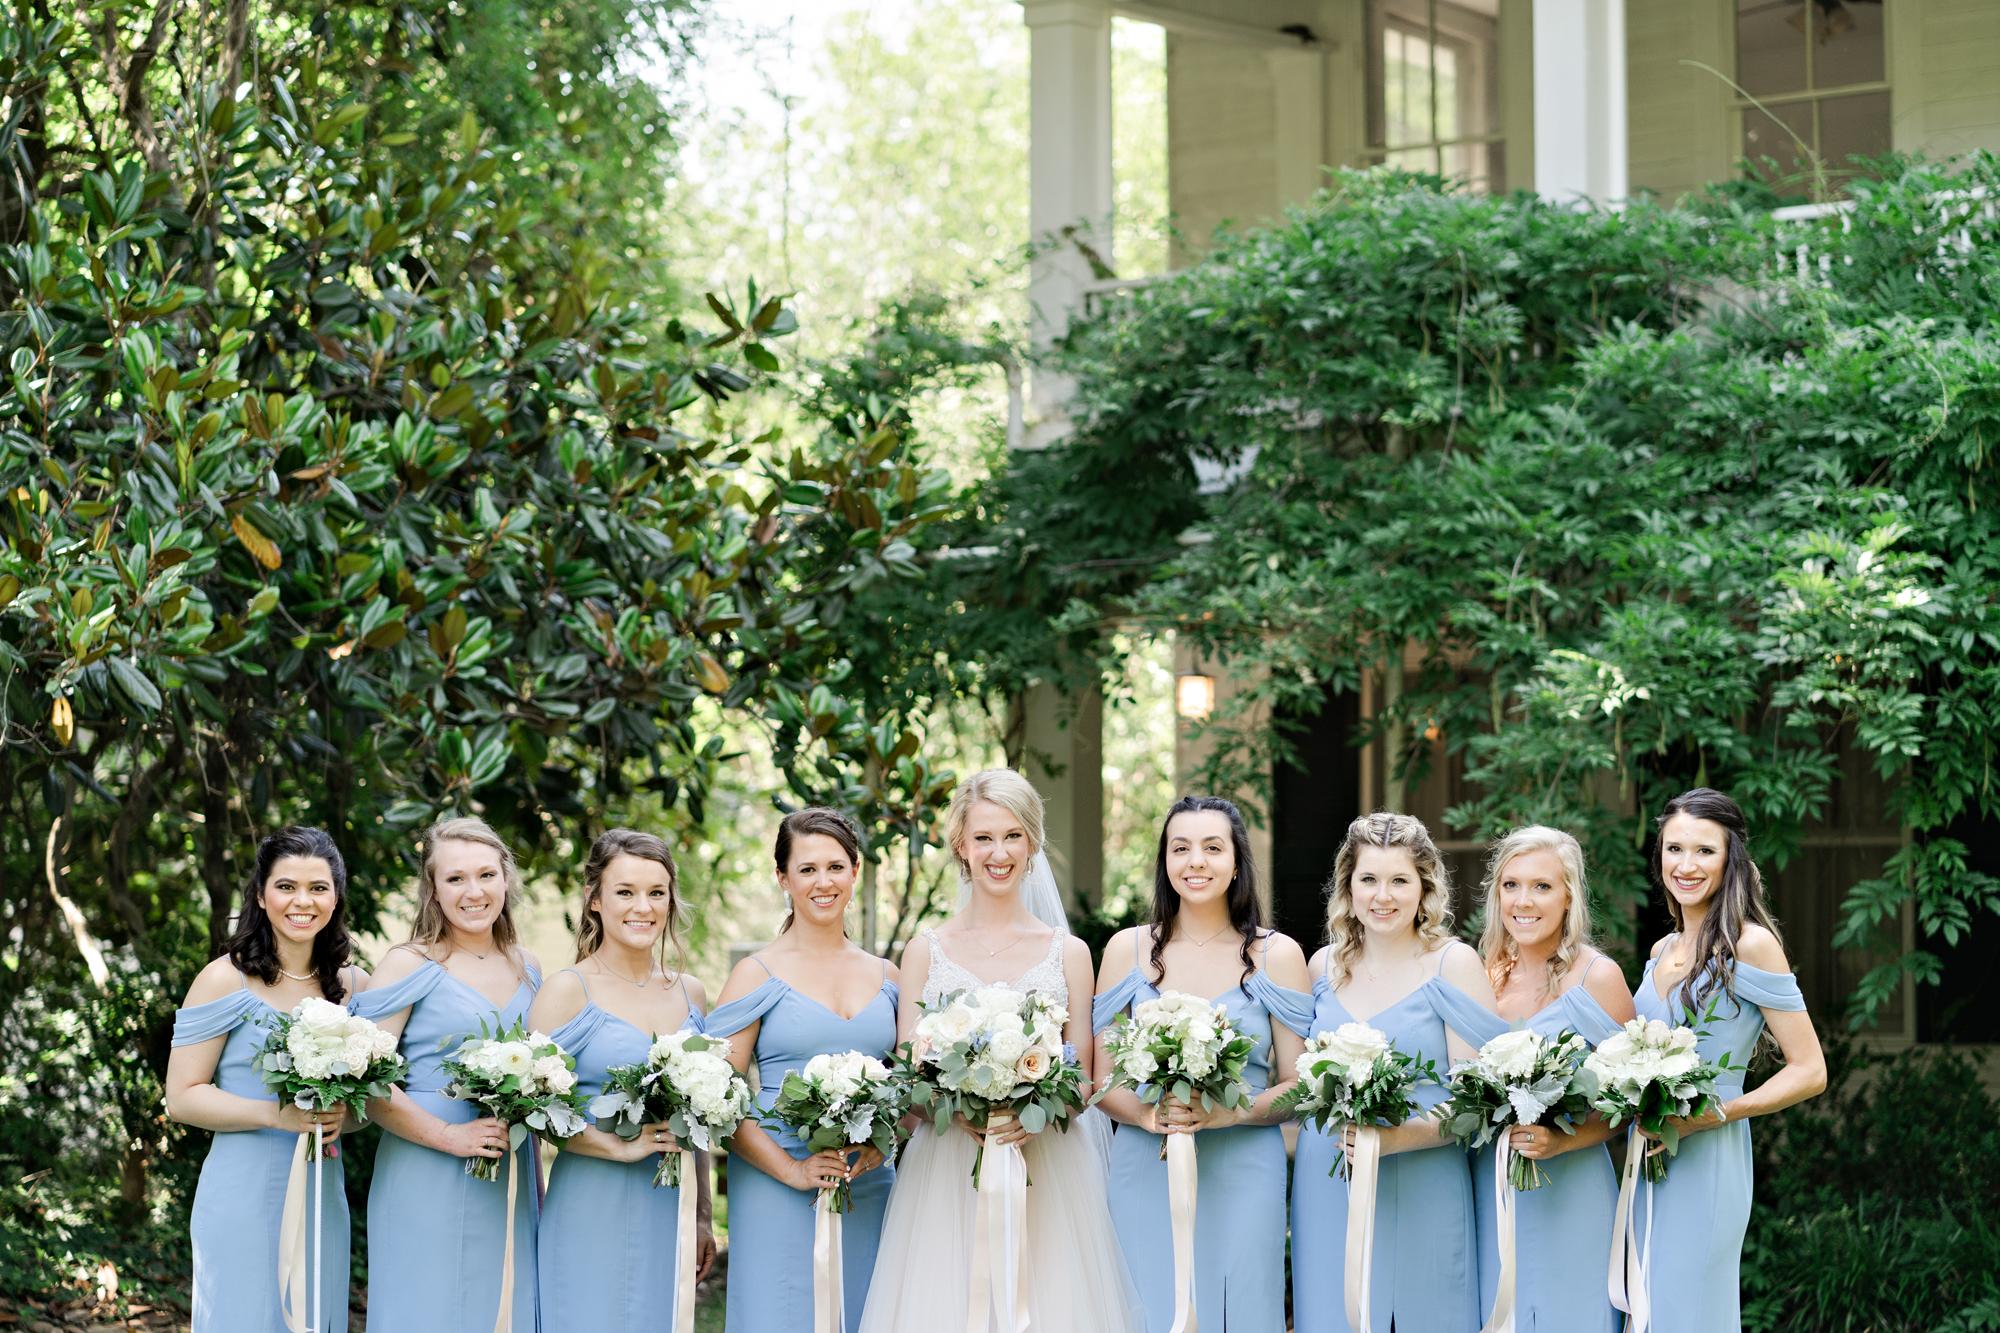 Alabama-Photographers-Nick-Drollette-Wedding-Photography-122.jpg